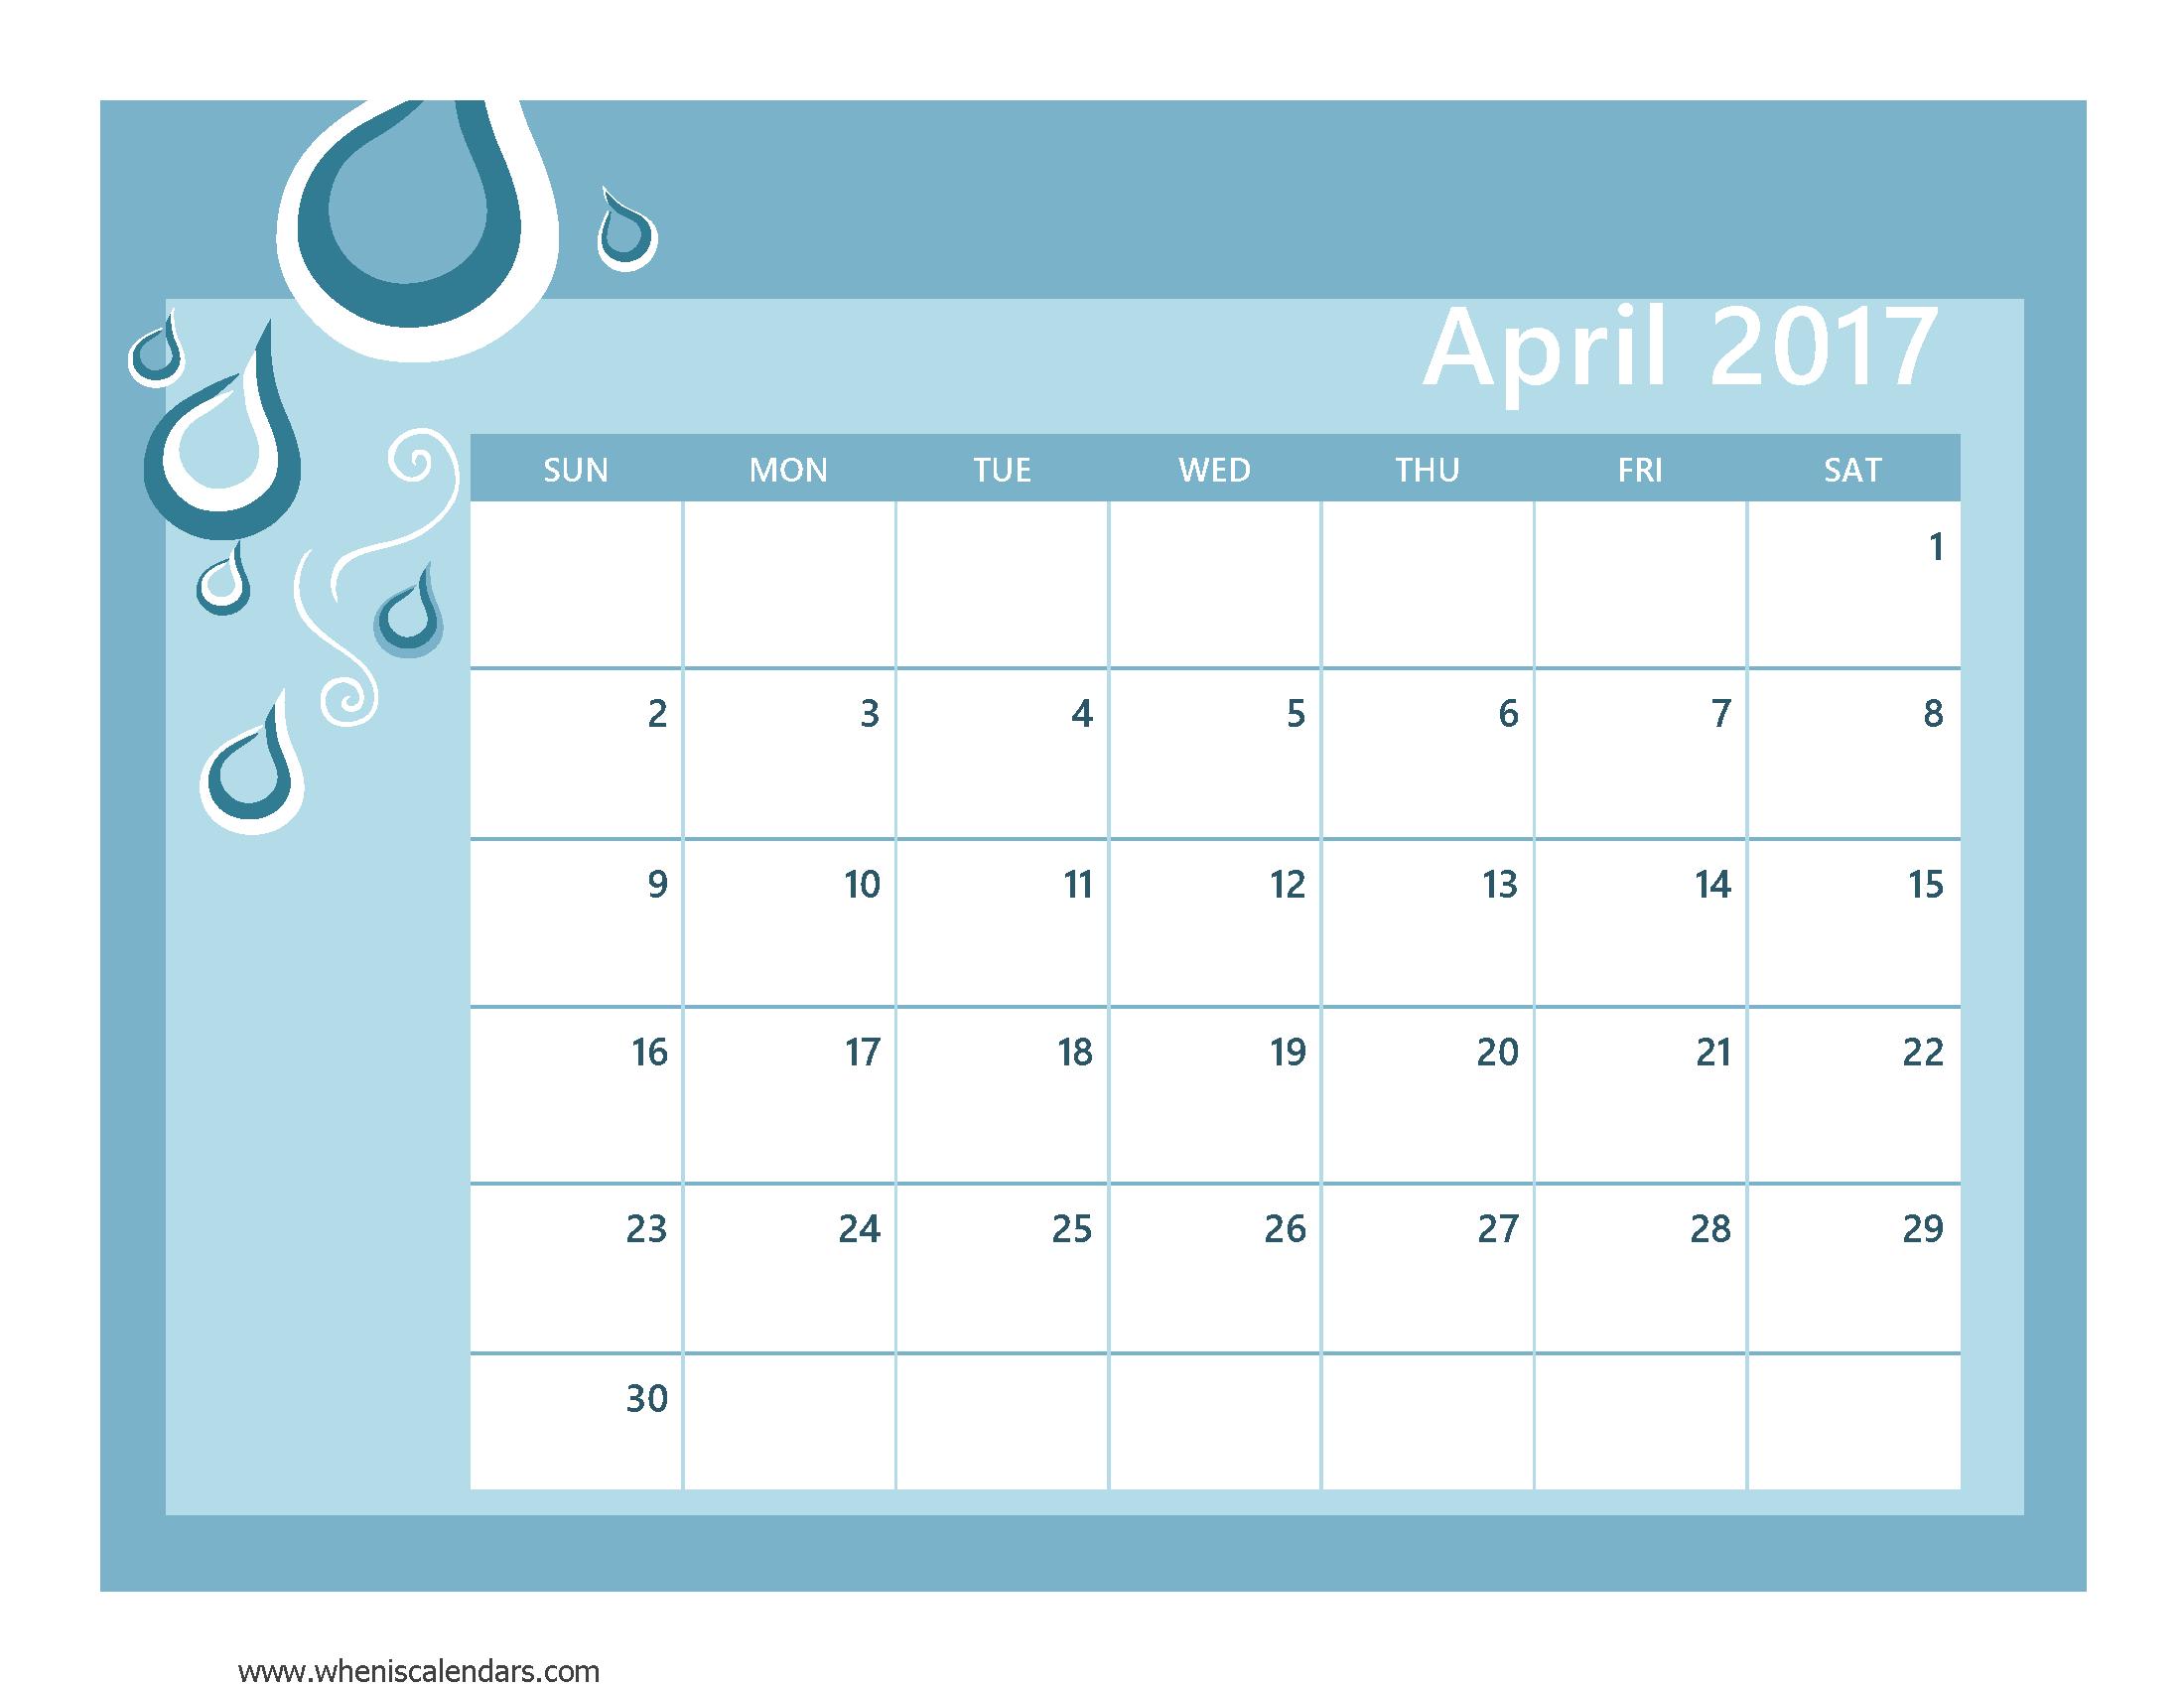 2017 Calendar April Calendar 2017 April 2017 Printable Calendar